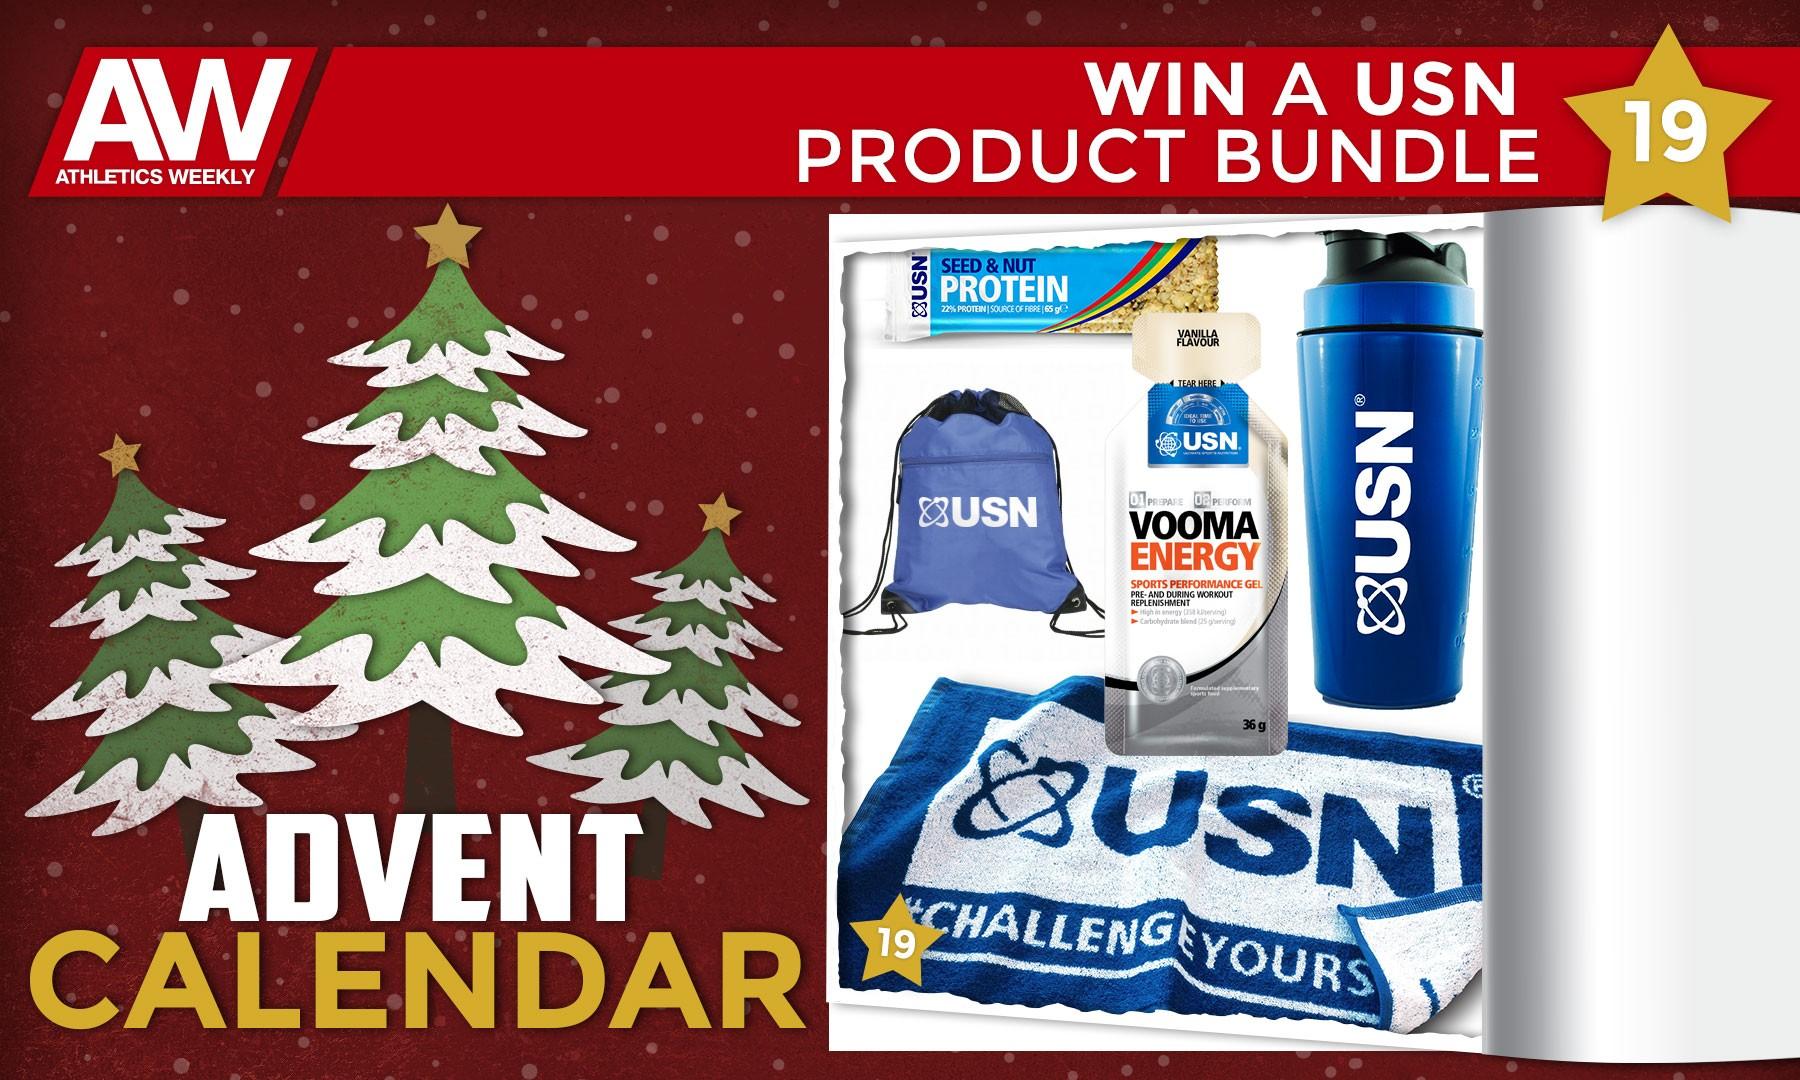 Win a USN product bundle